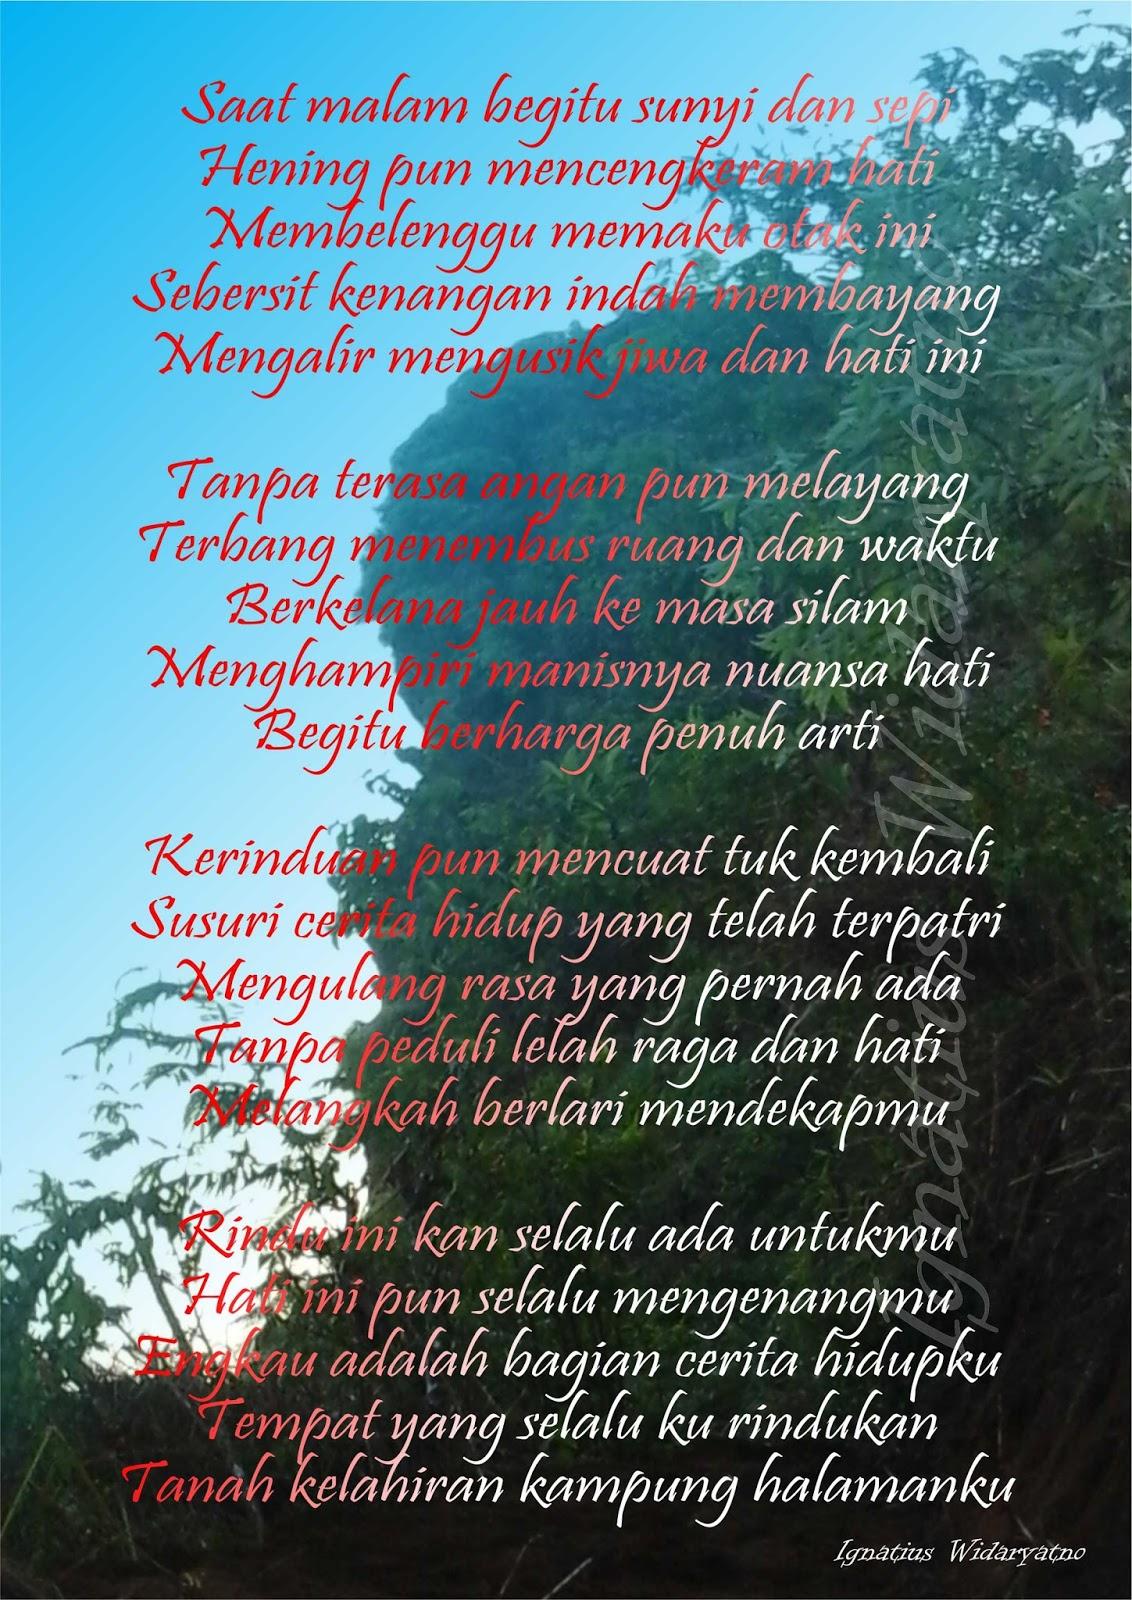 Kata Kata Mutiara Dan Puisi Ungkapan Jiwa Puisi Tanah Kelahiran